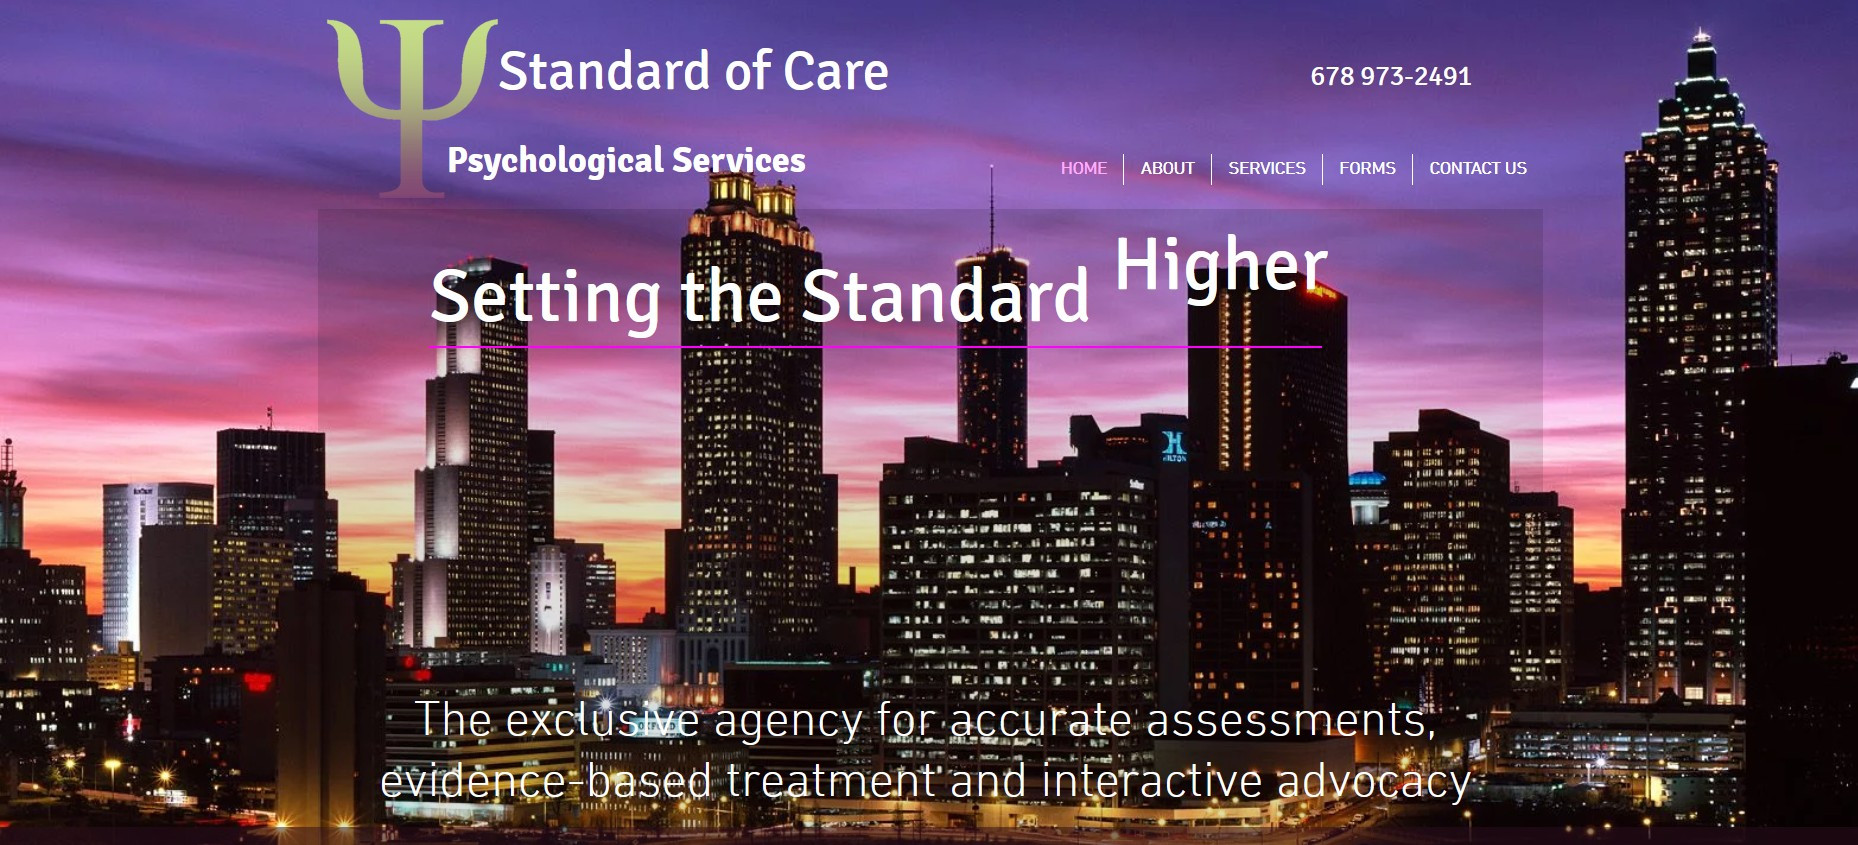 Standard of Care- Psychological Services